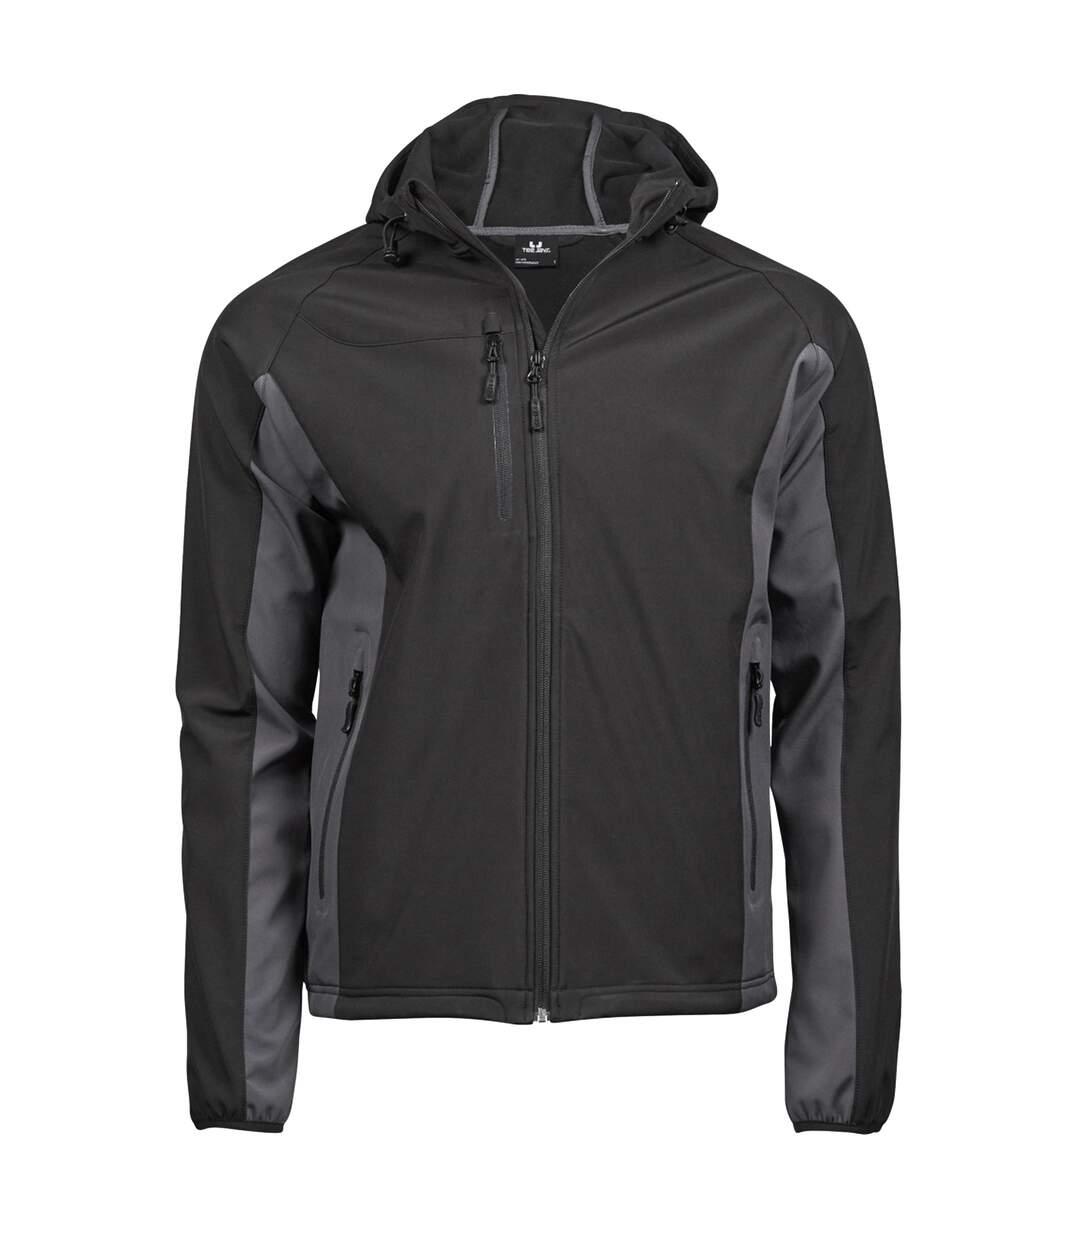 Tee Jays Mens Hooded Fashion Softshell Jacket (Black/Dark Grey) - UTBC3327